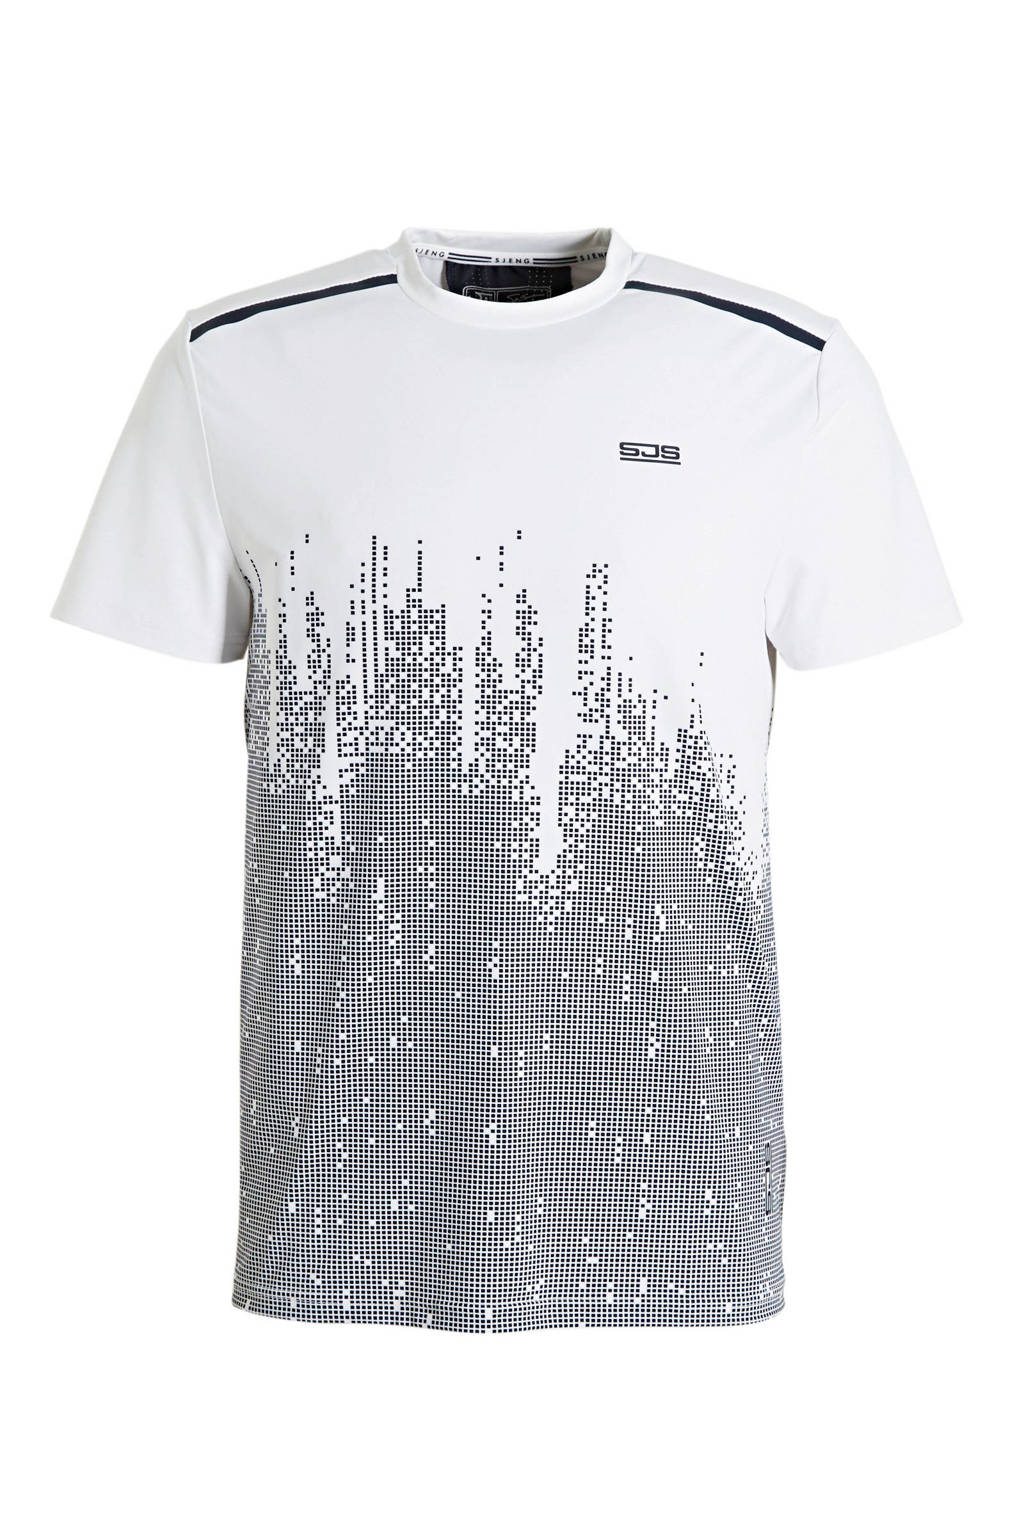 Sjeng Sports   T-shirt wit/donkerblauw, Wit/donkerblauw